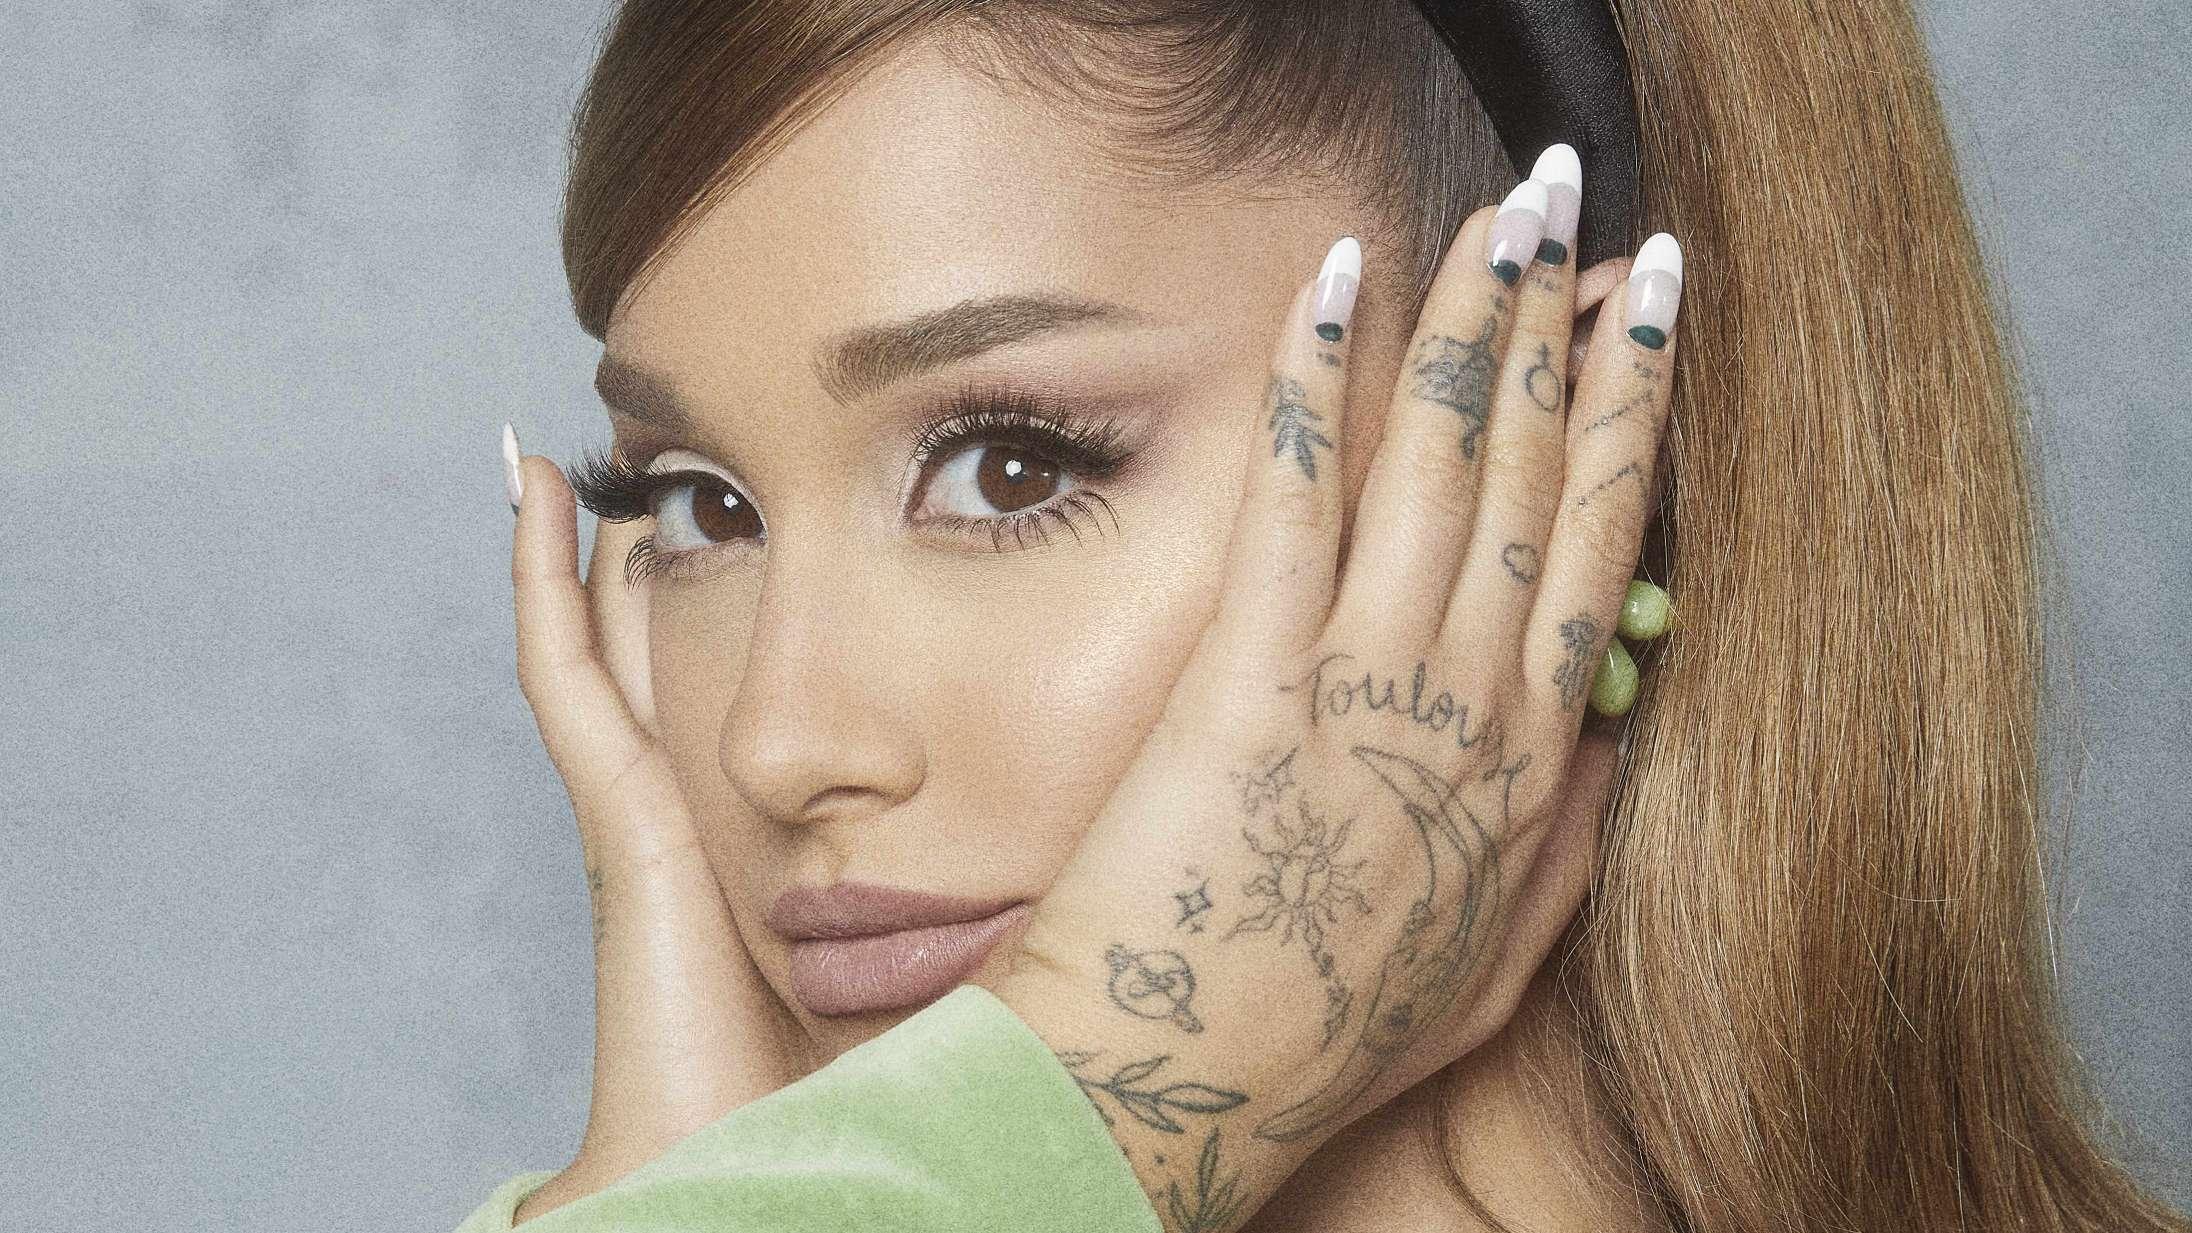 Ariana Grande er blevet gift: »Det var småt og intimt«